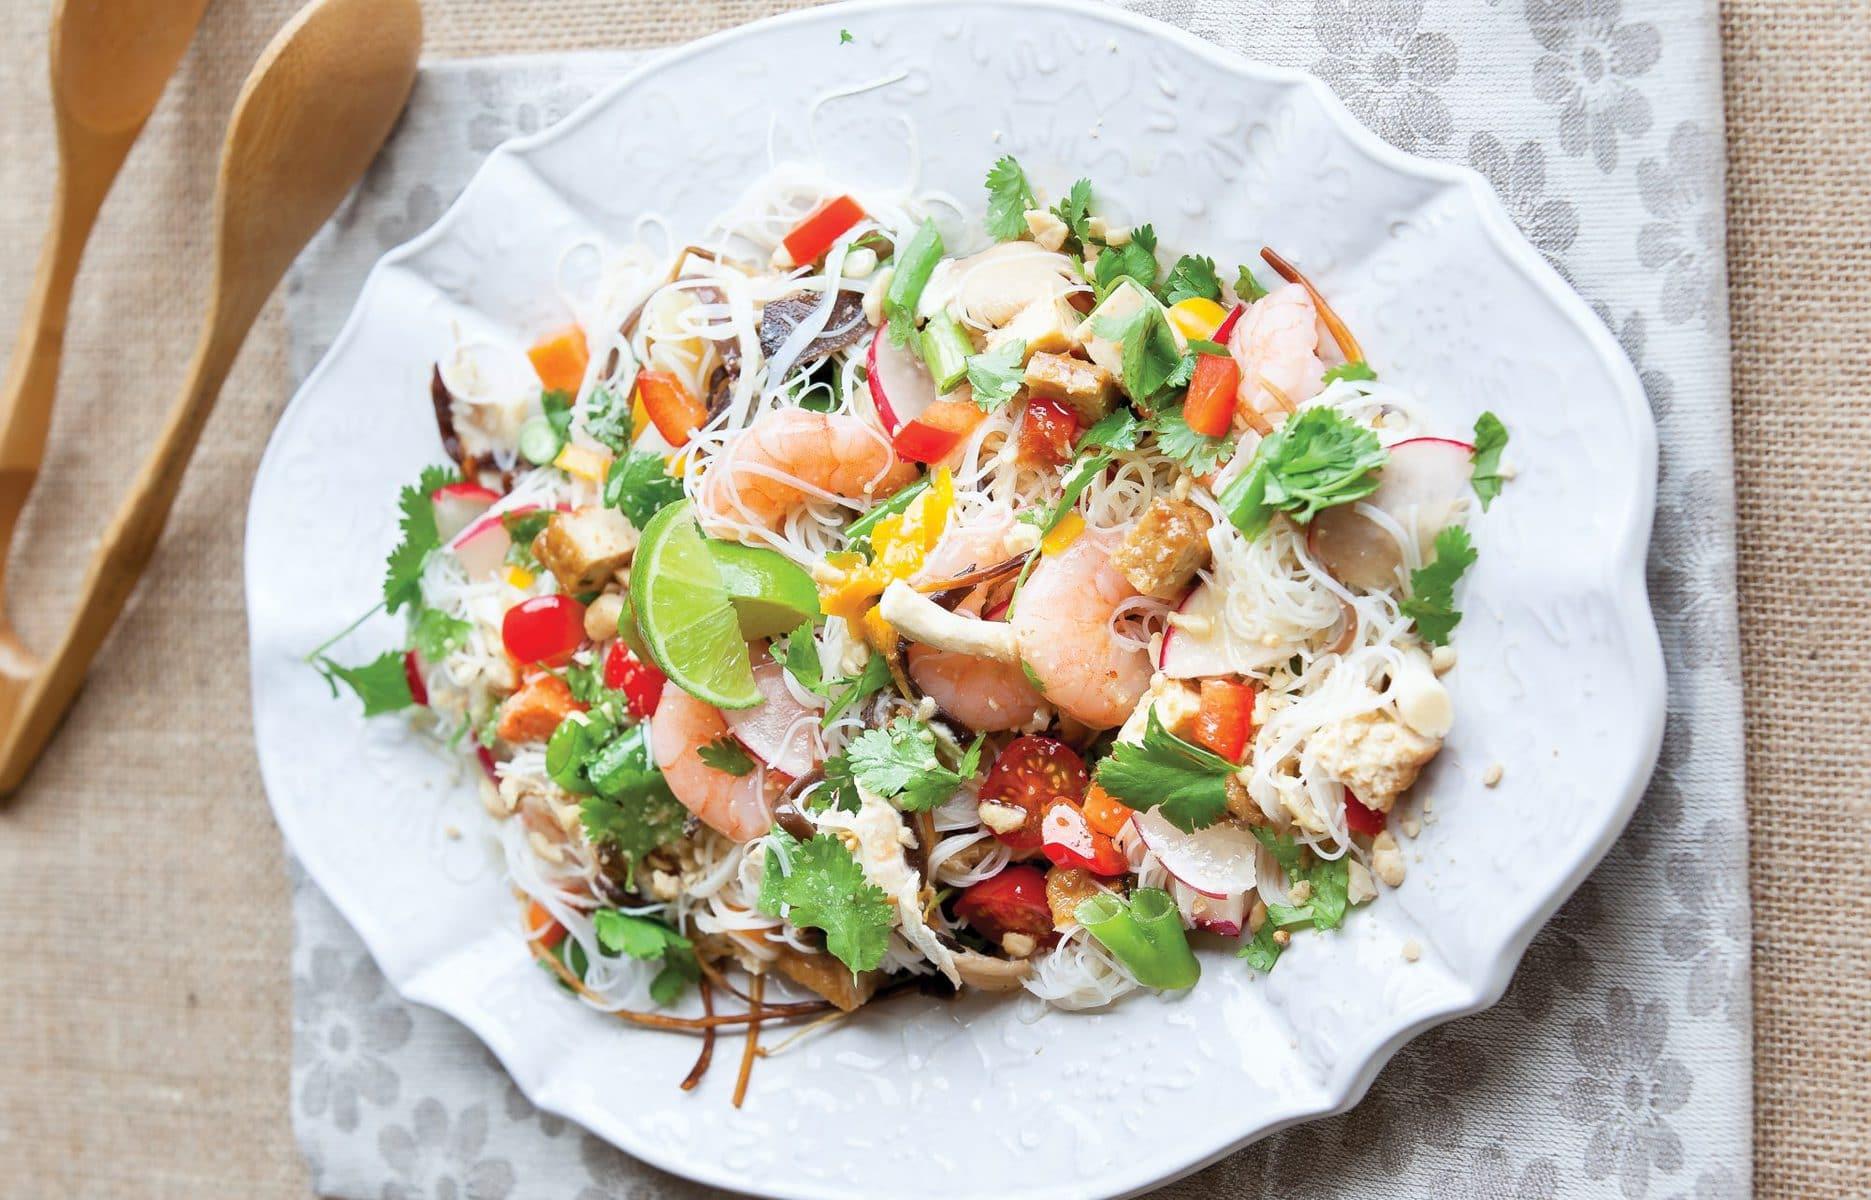 Prawn and tofu noodle salad